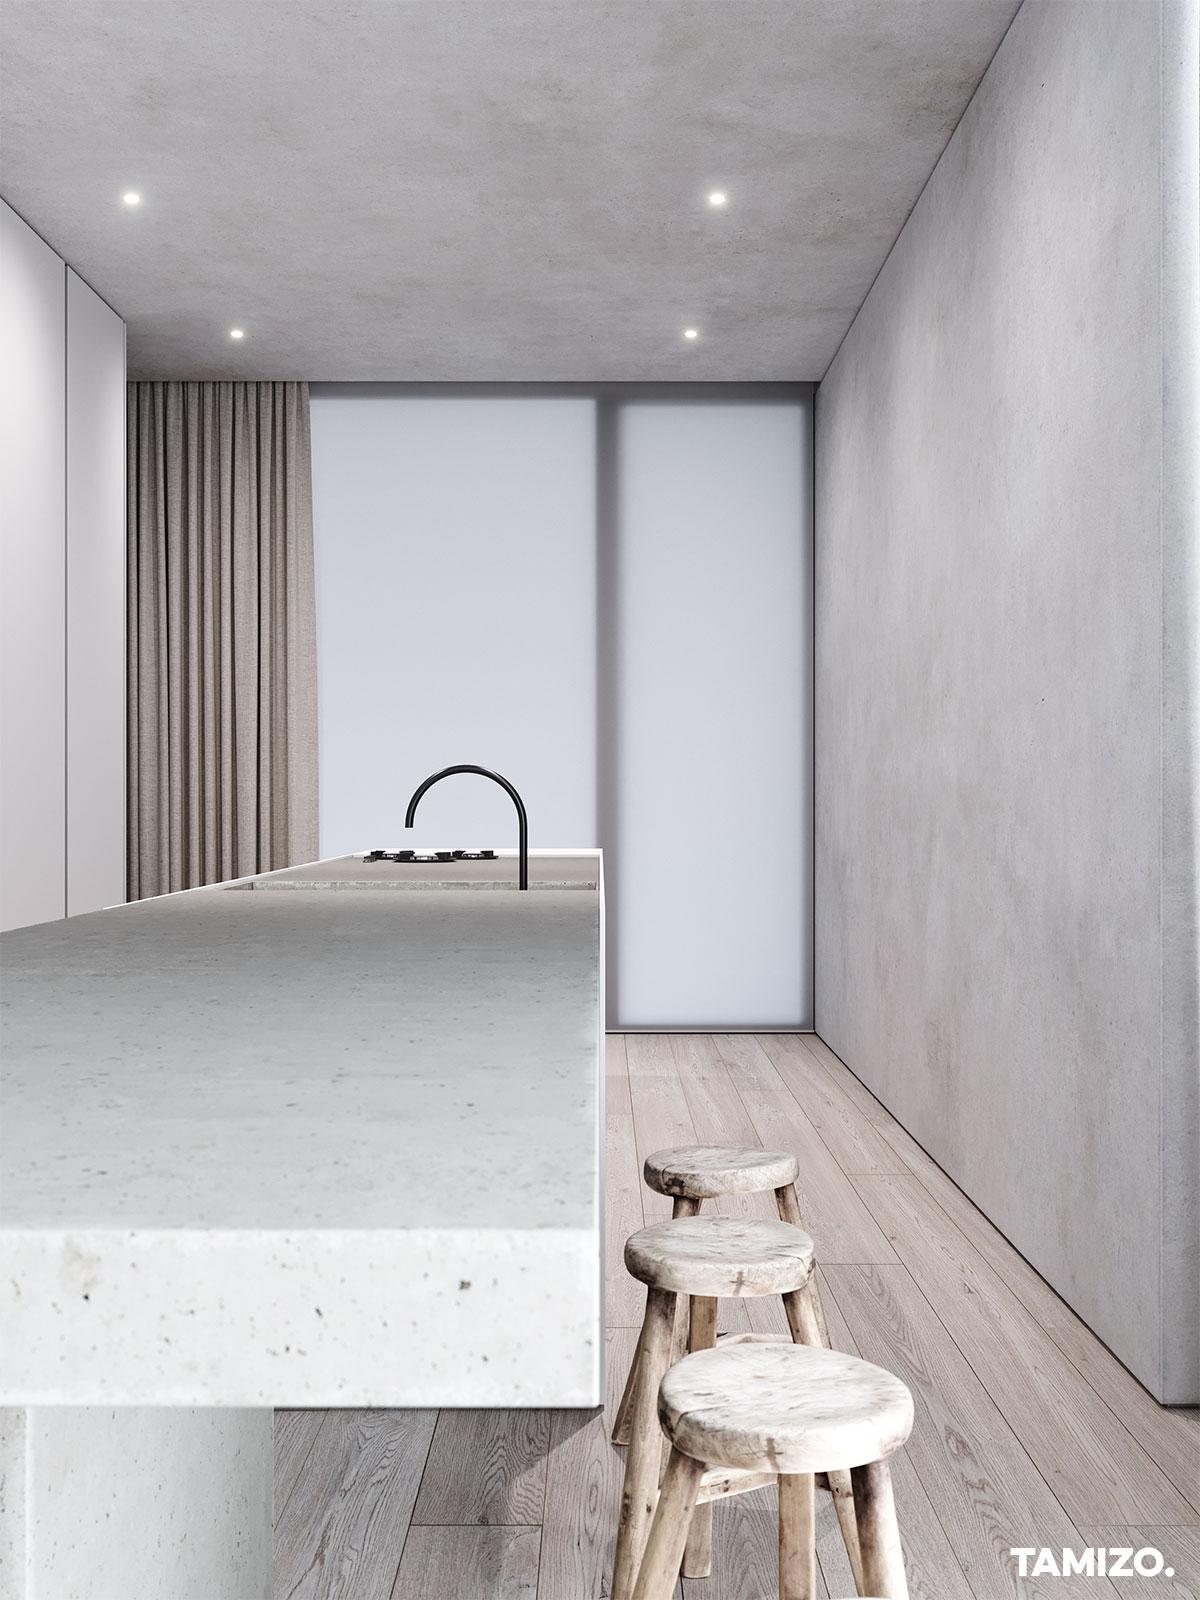 tamizo_architects_mateusz_kuo_stolarski_warszawa_iterior_design_house_minimal_03